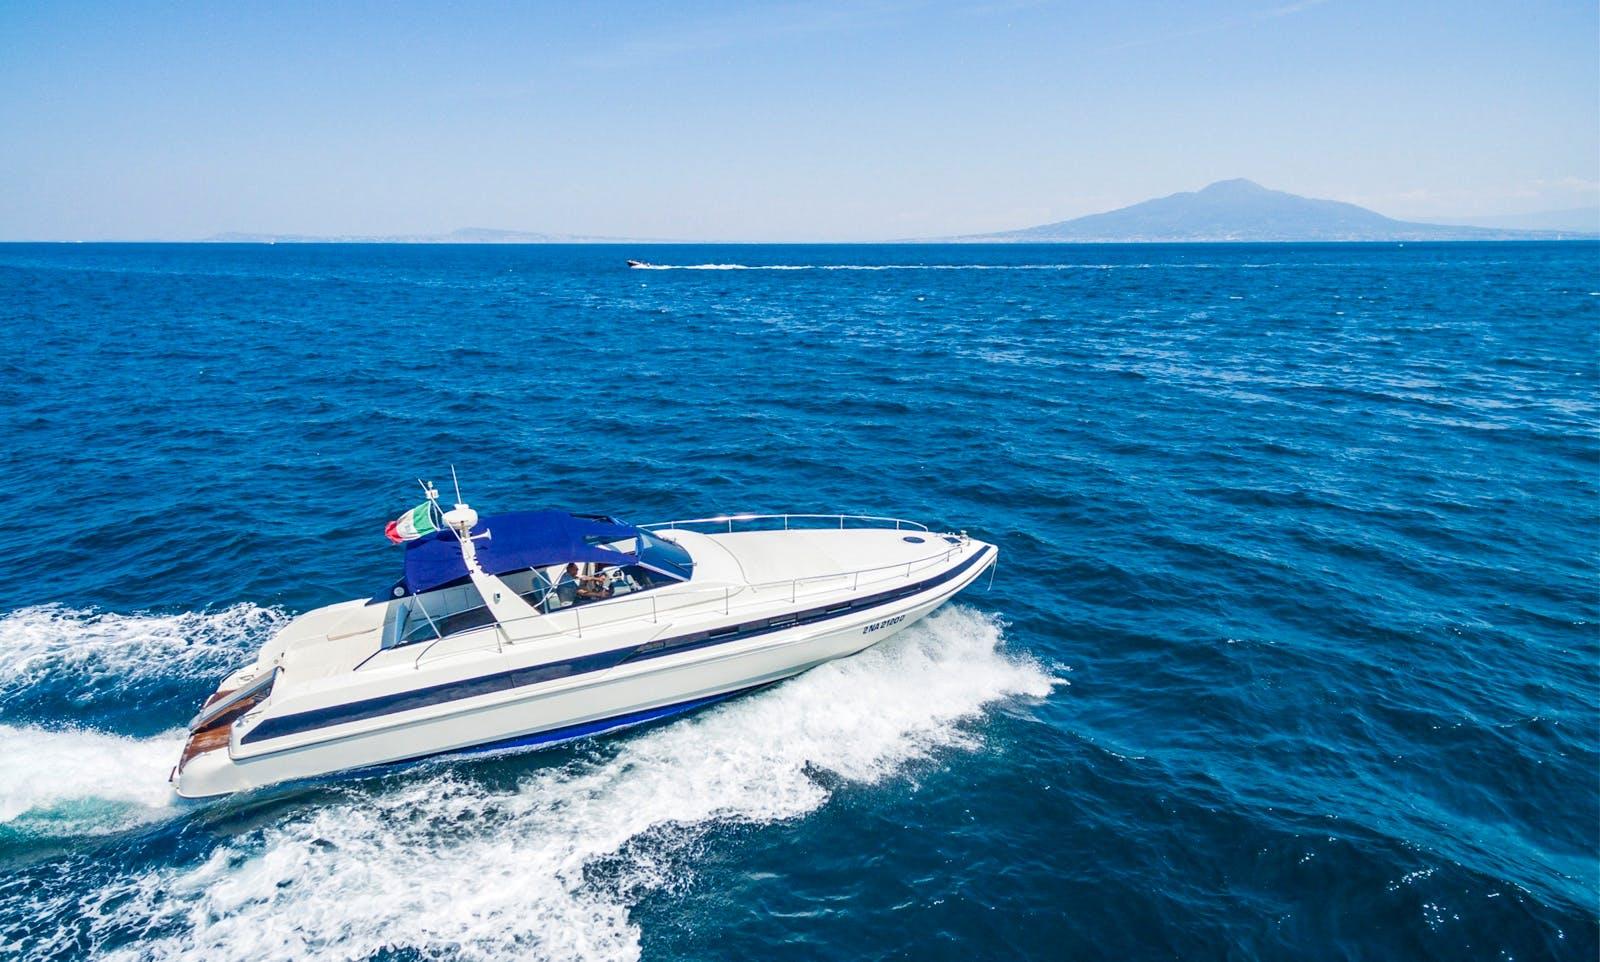 Conam 52 Motor Yacht on Amalfi Coast in Italy